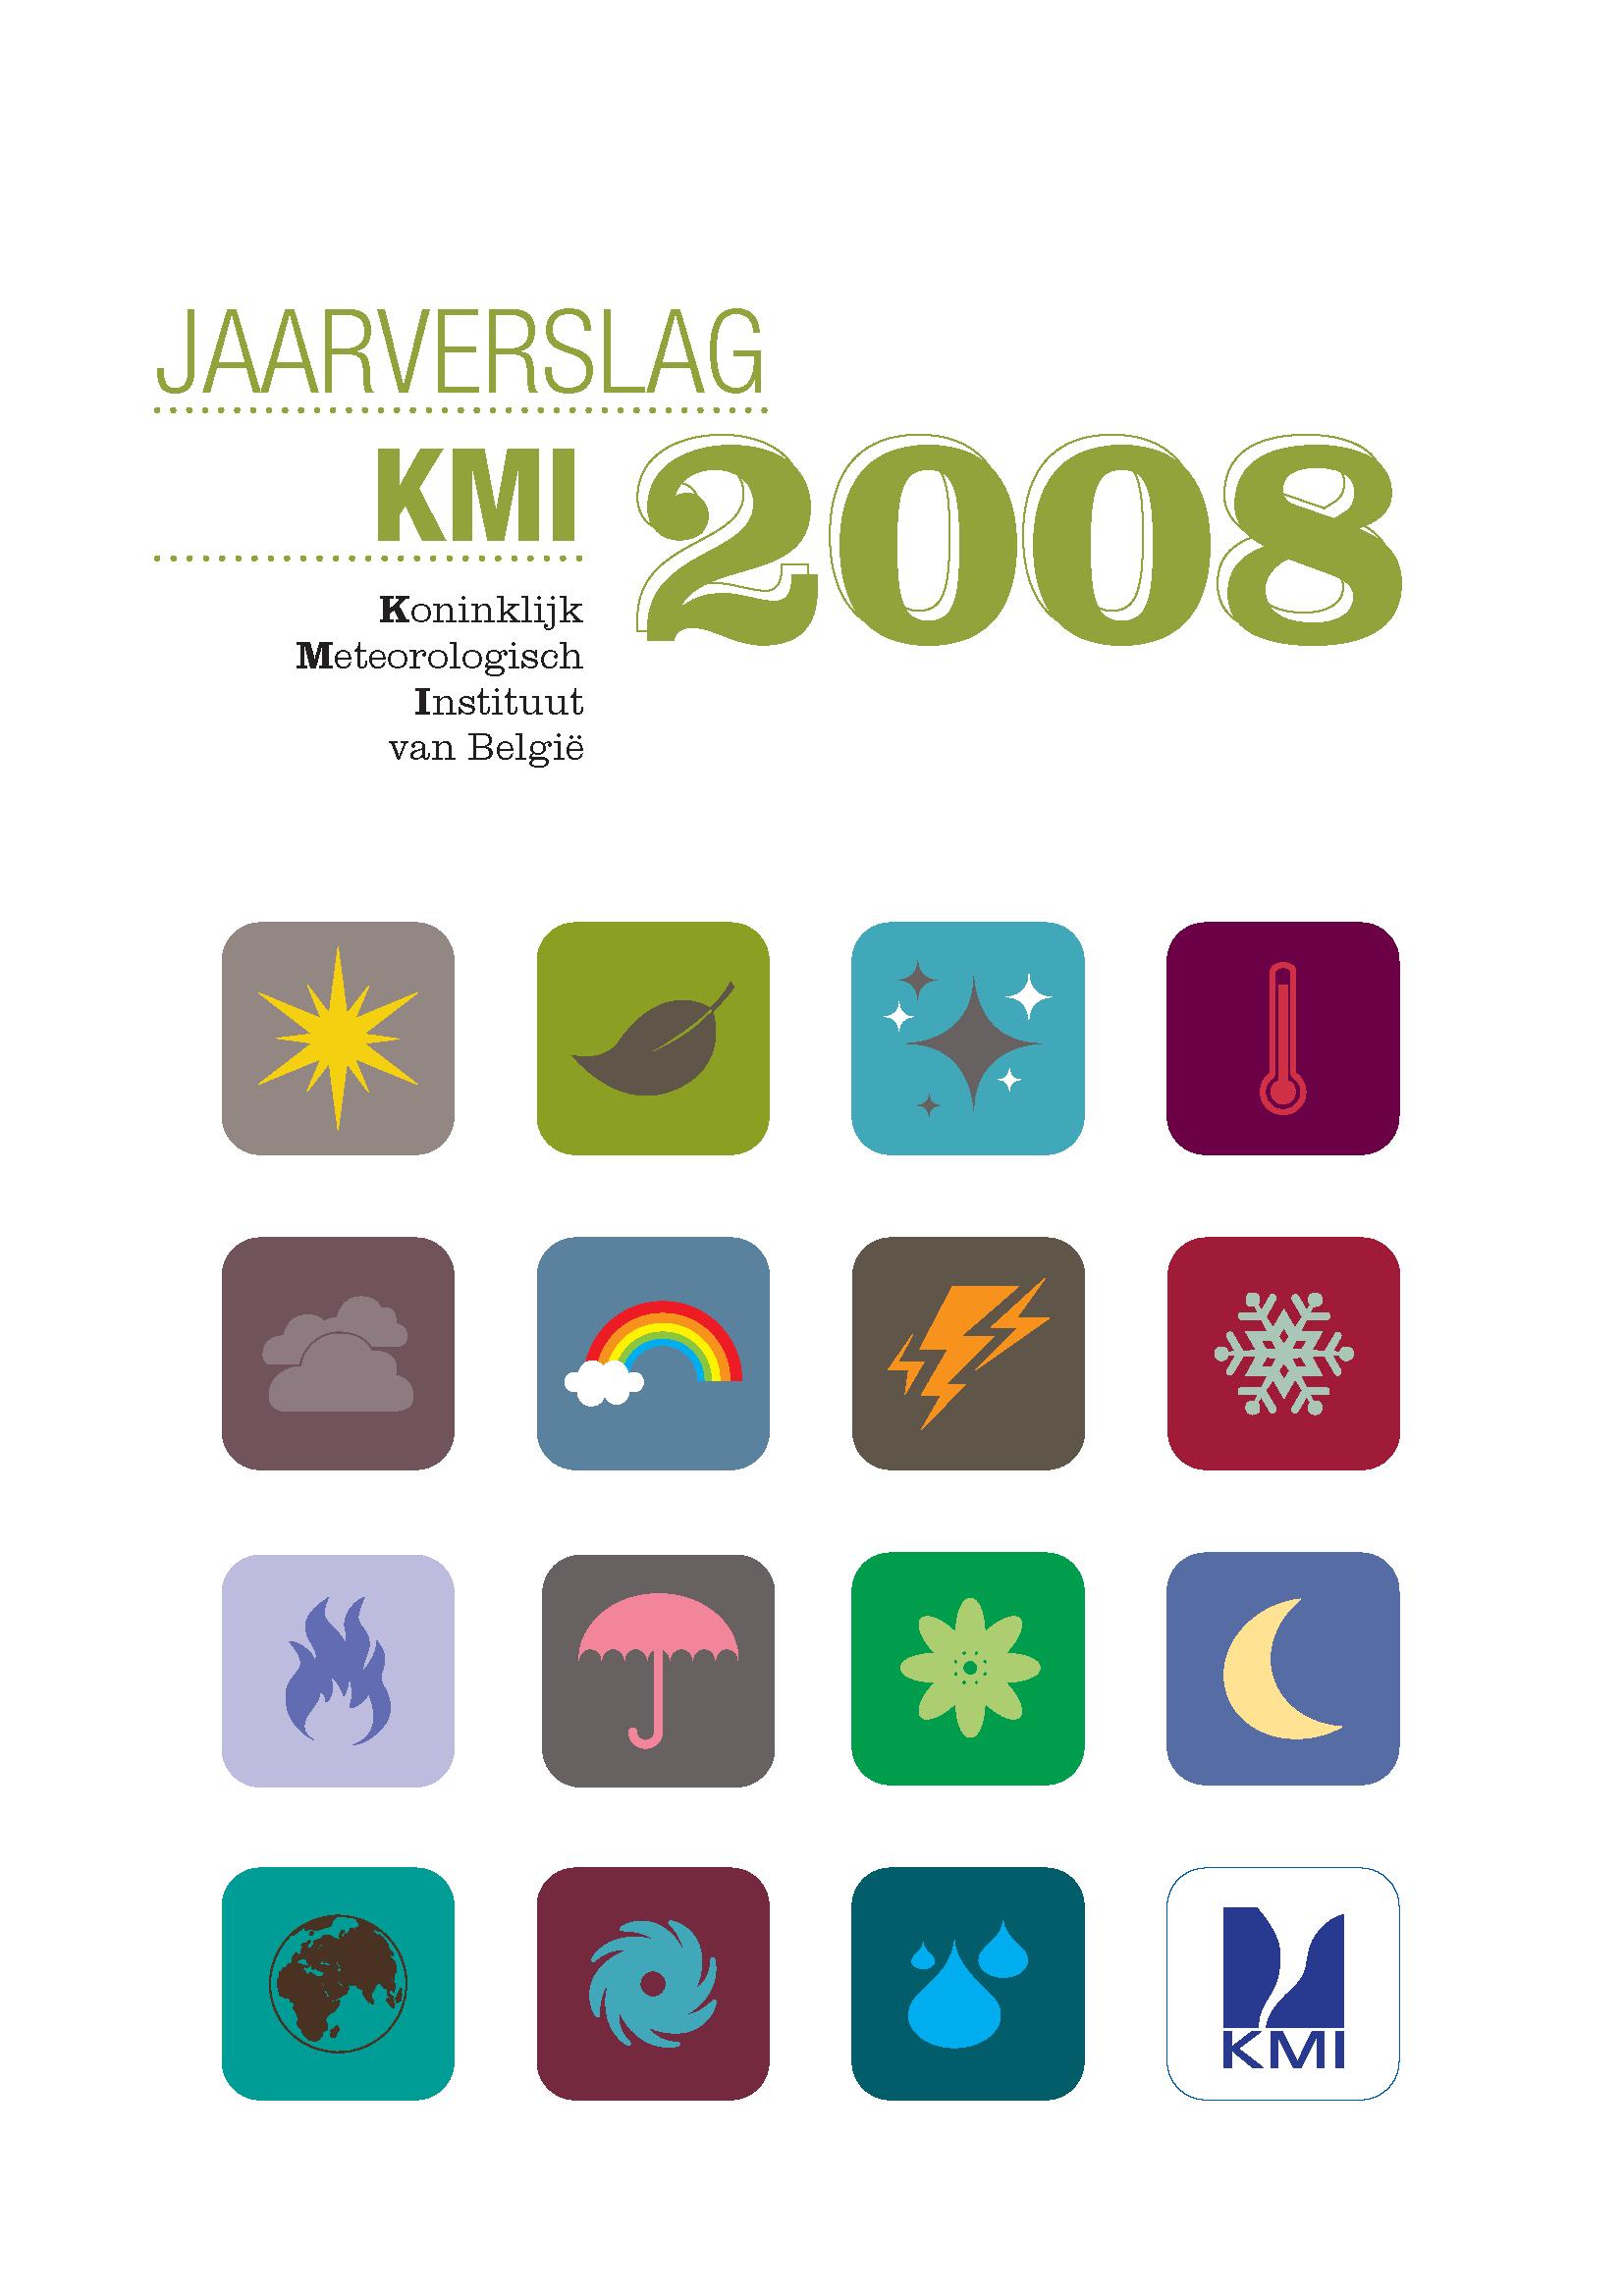 KMI rapport copywriting jaarverslag